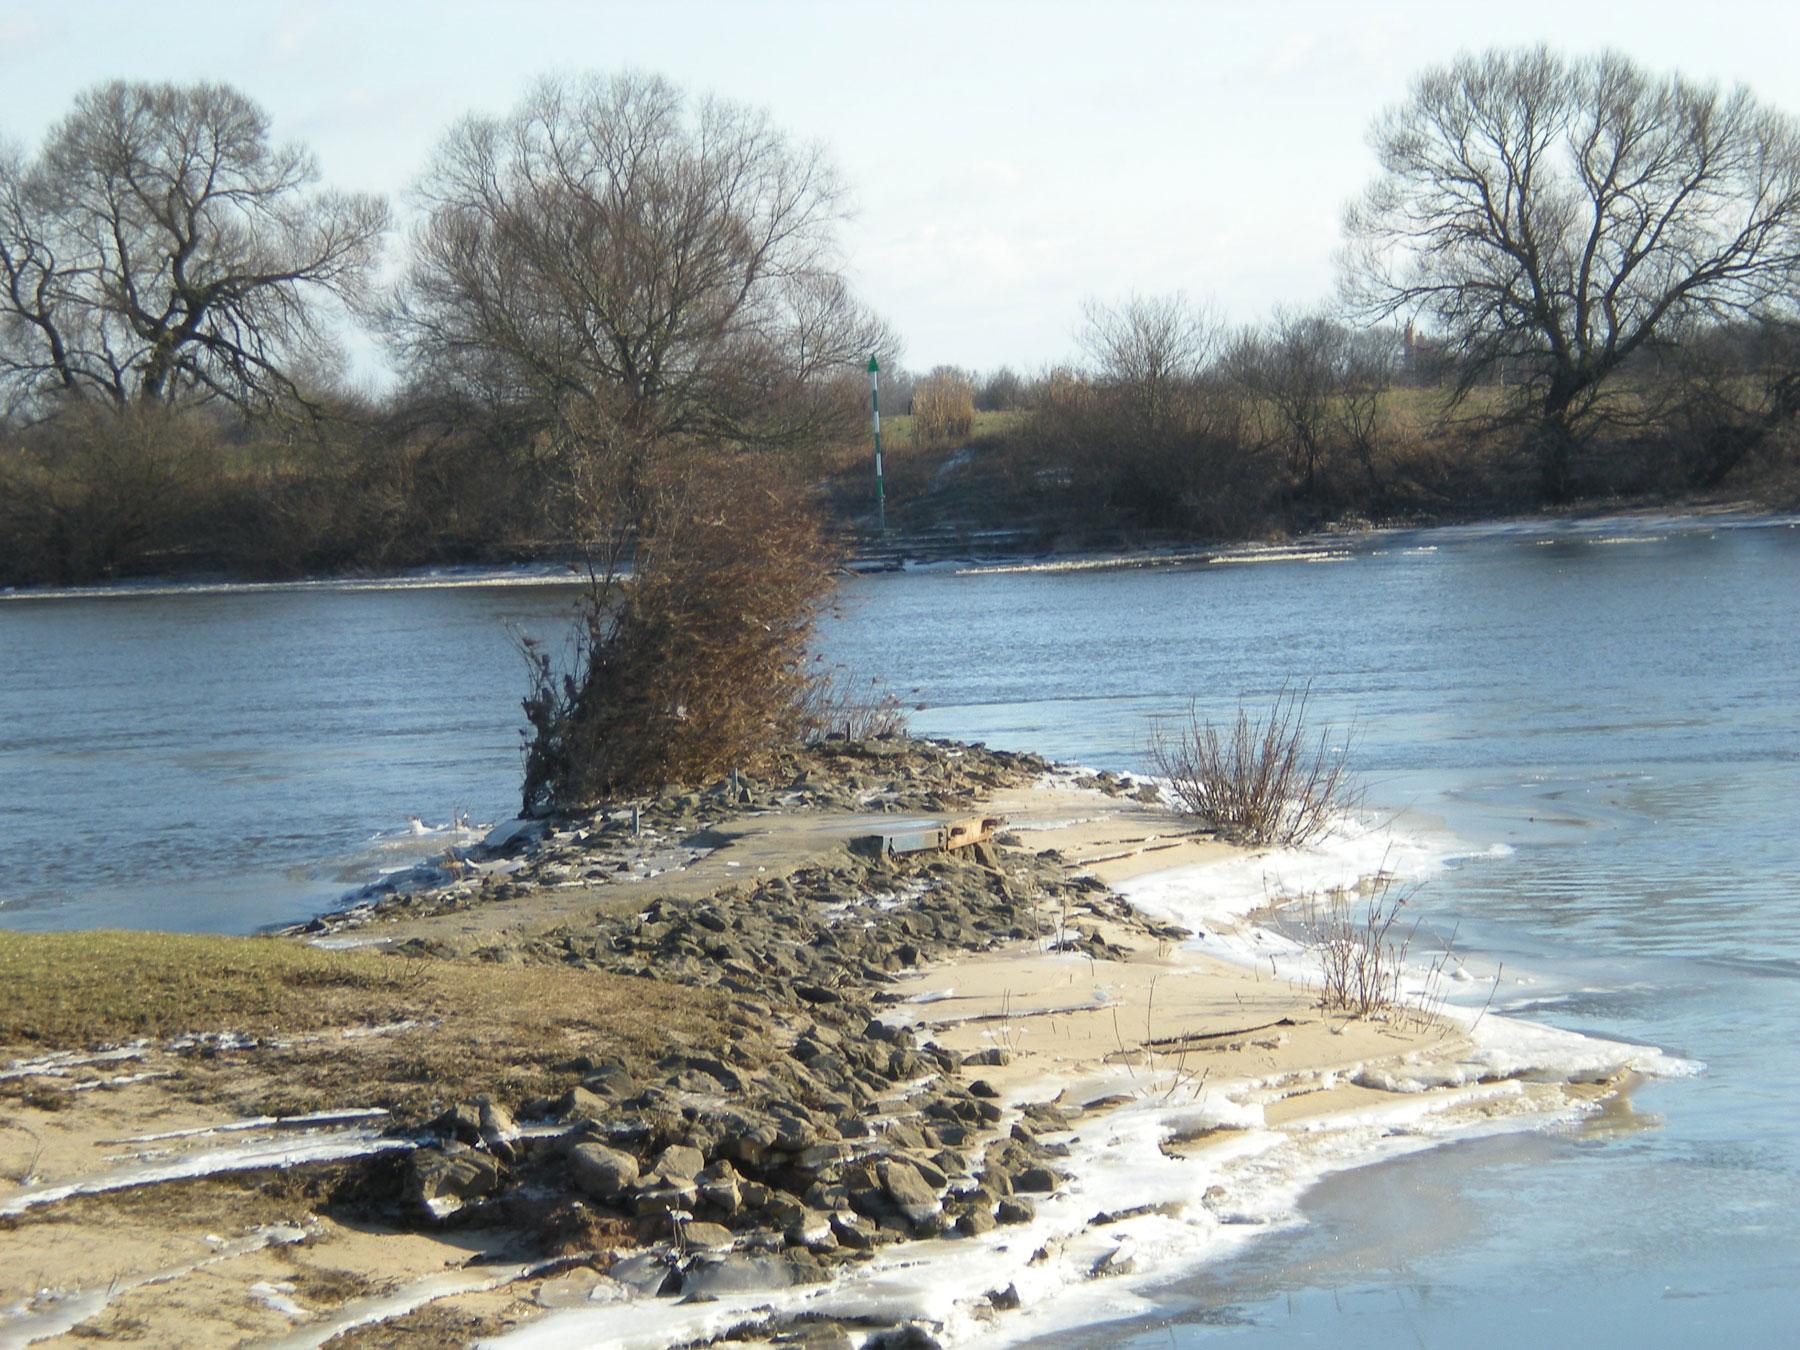 Weserufer im Winter